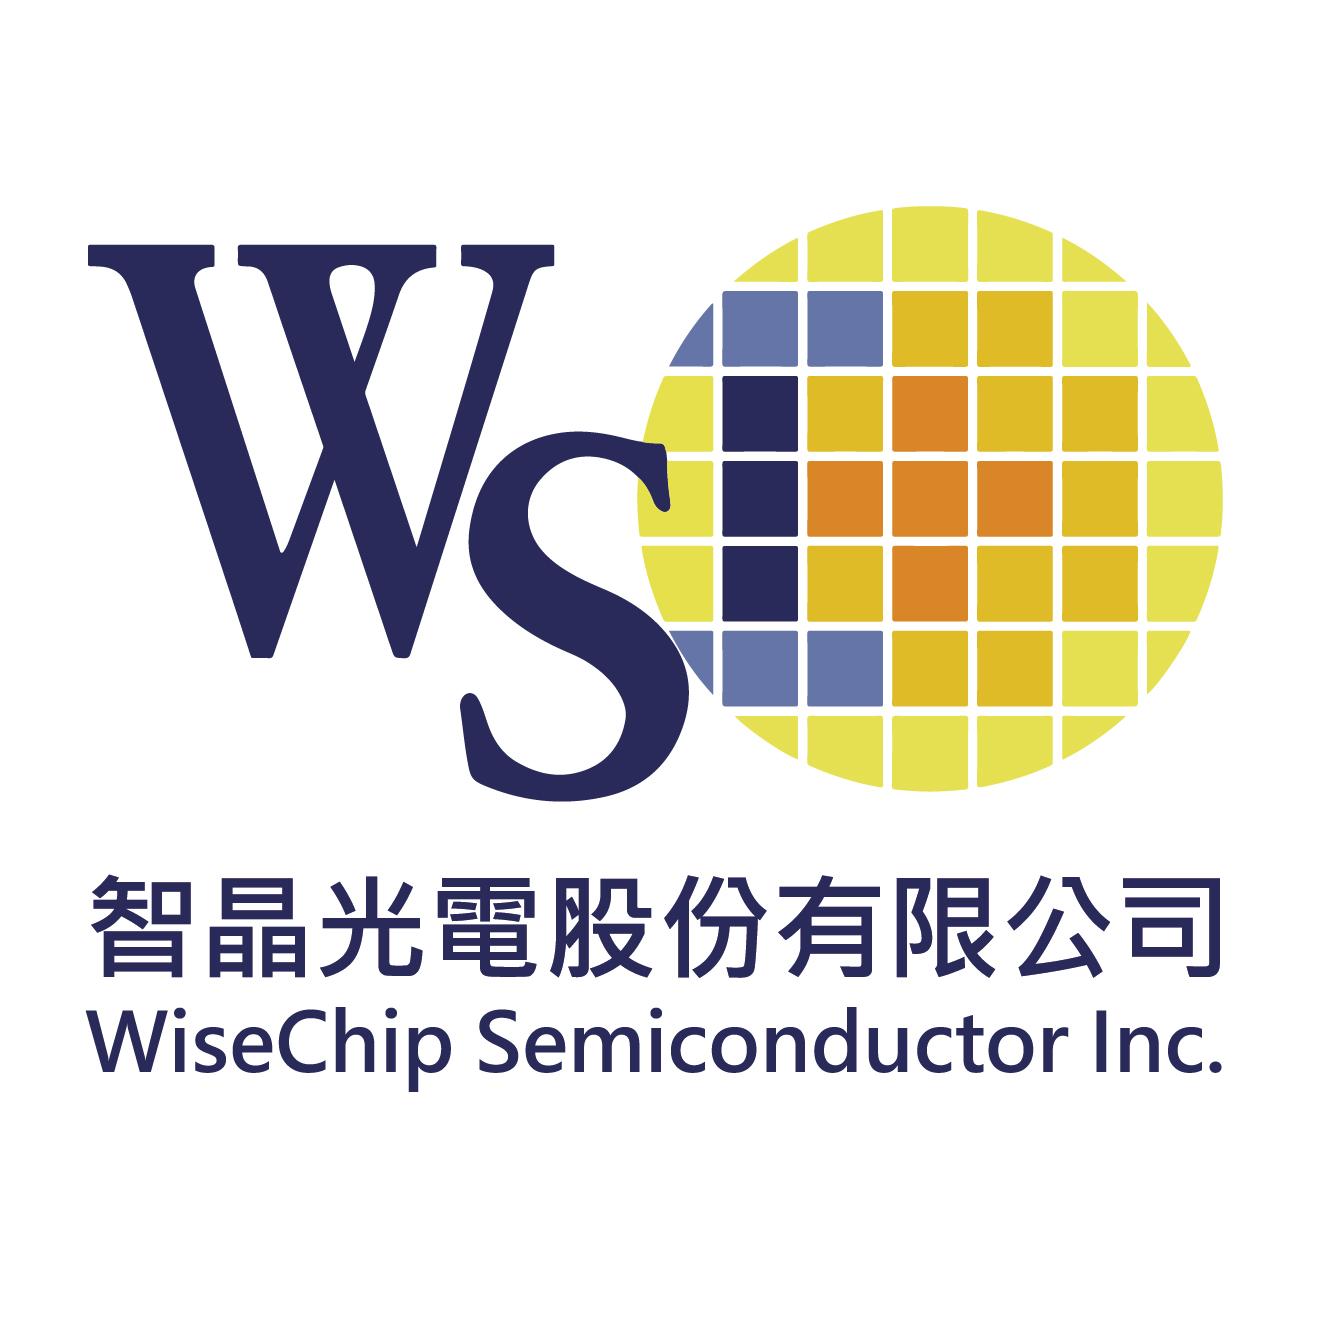 WiseChip Semiconductor Inc. -Logo